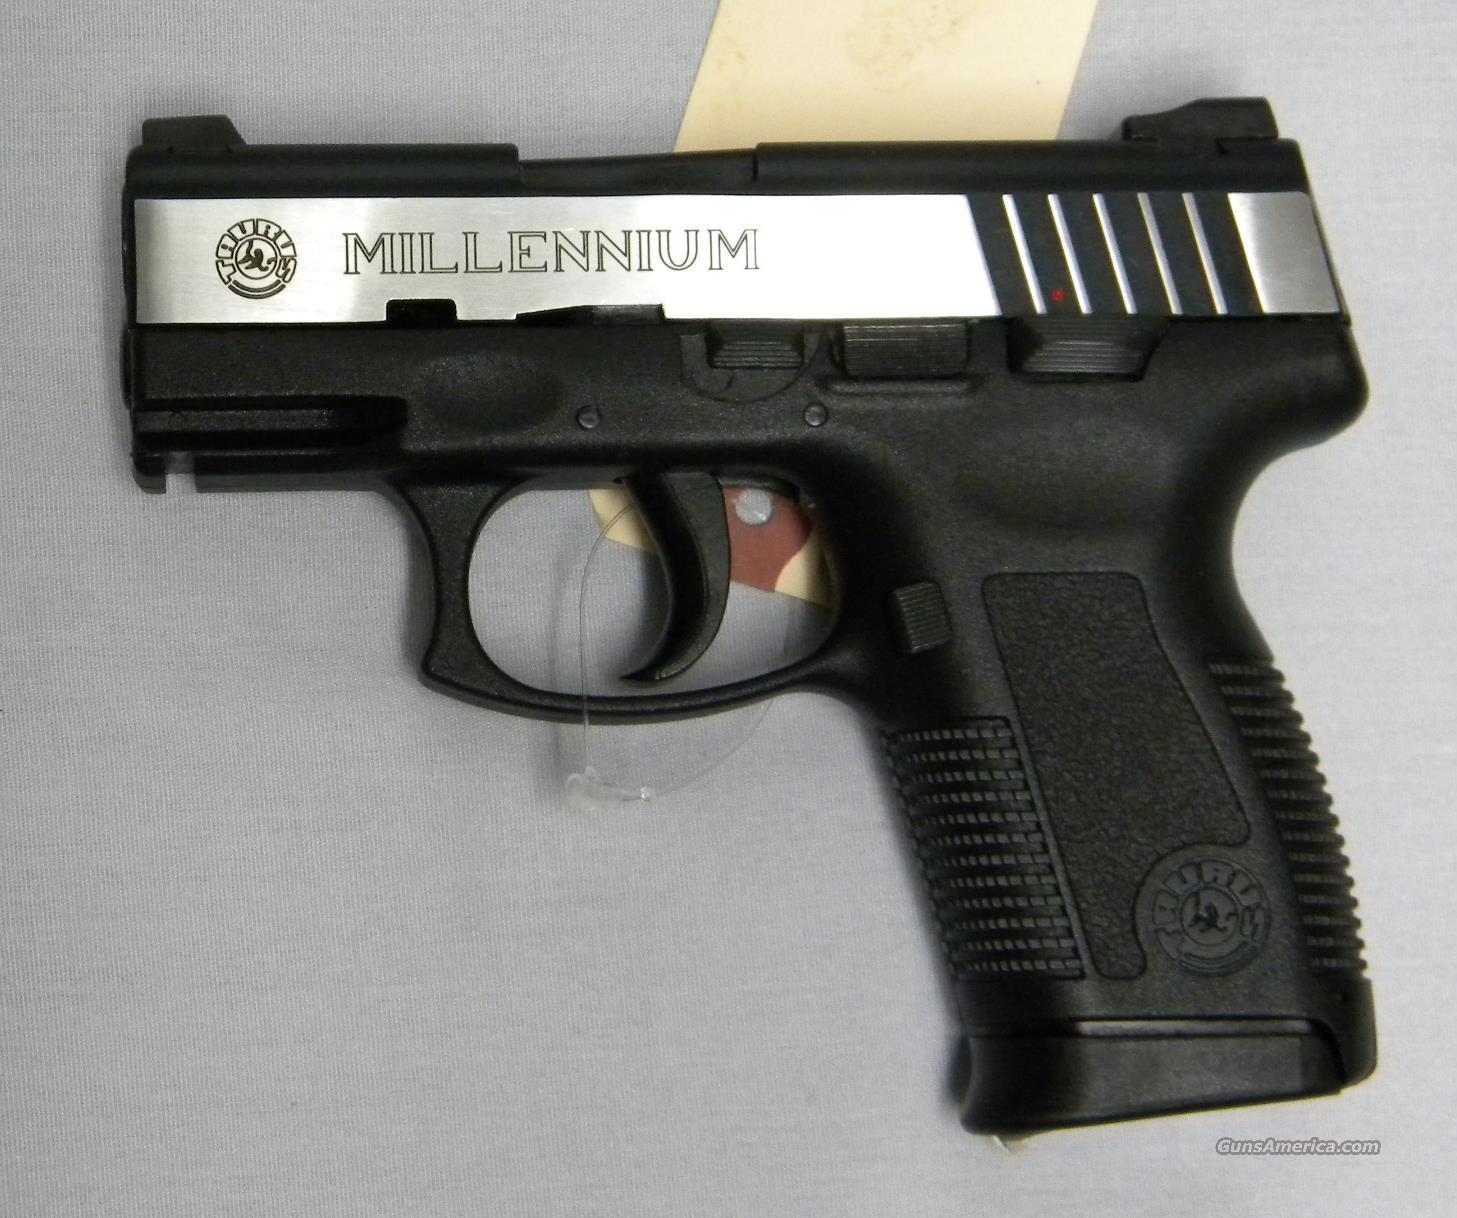 Millennium Auto Sales >> Taurus Millennium PT145 Pro, .45 ACP for sale